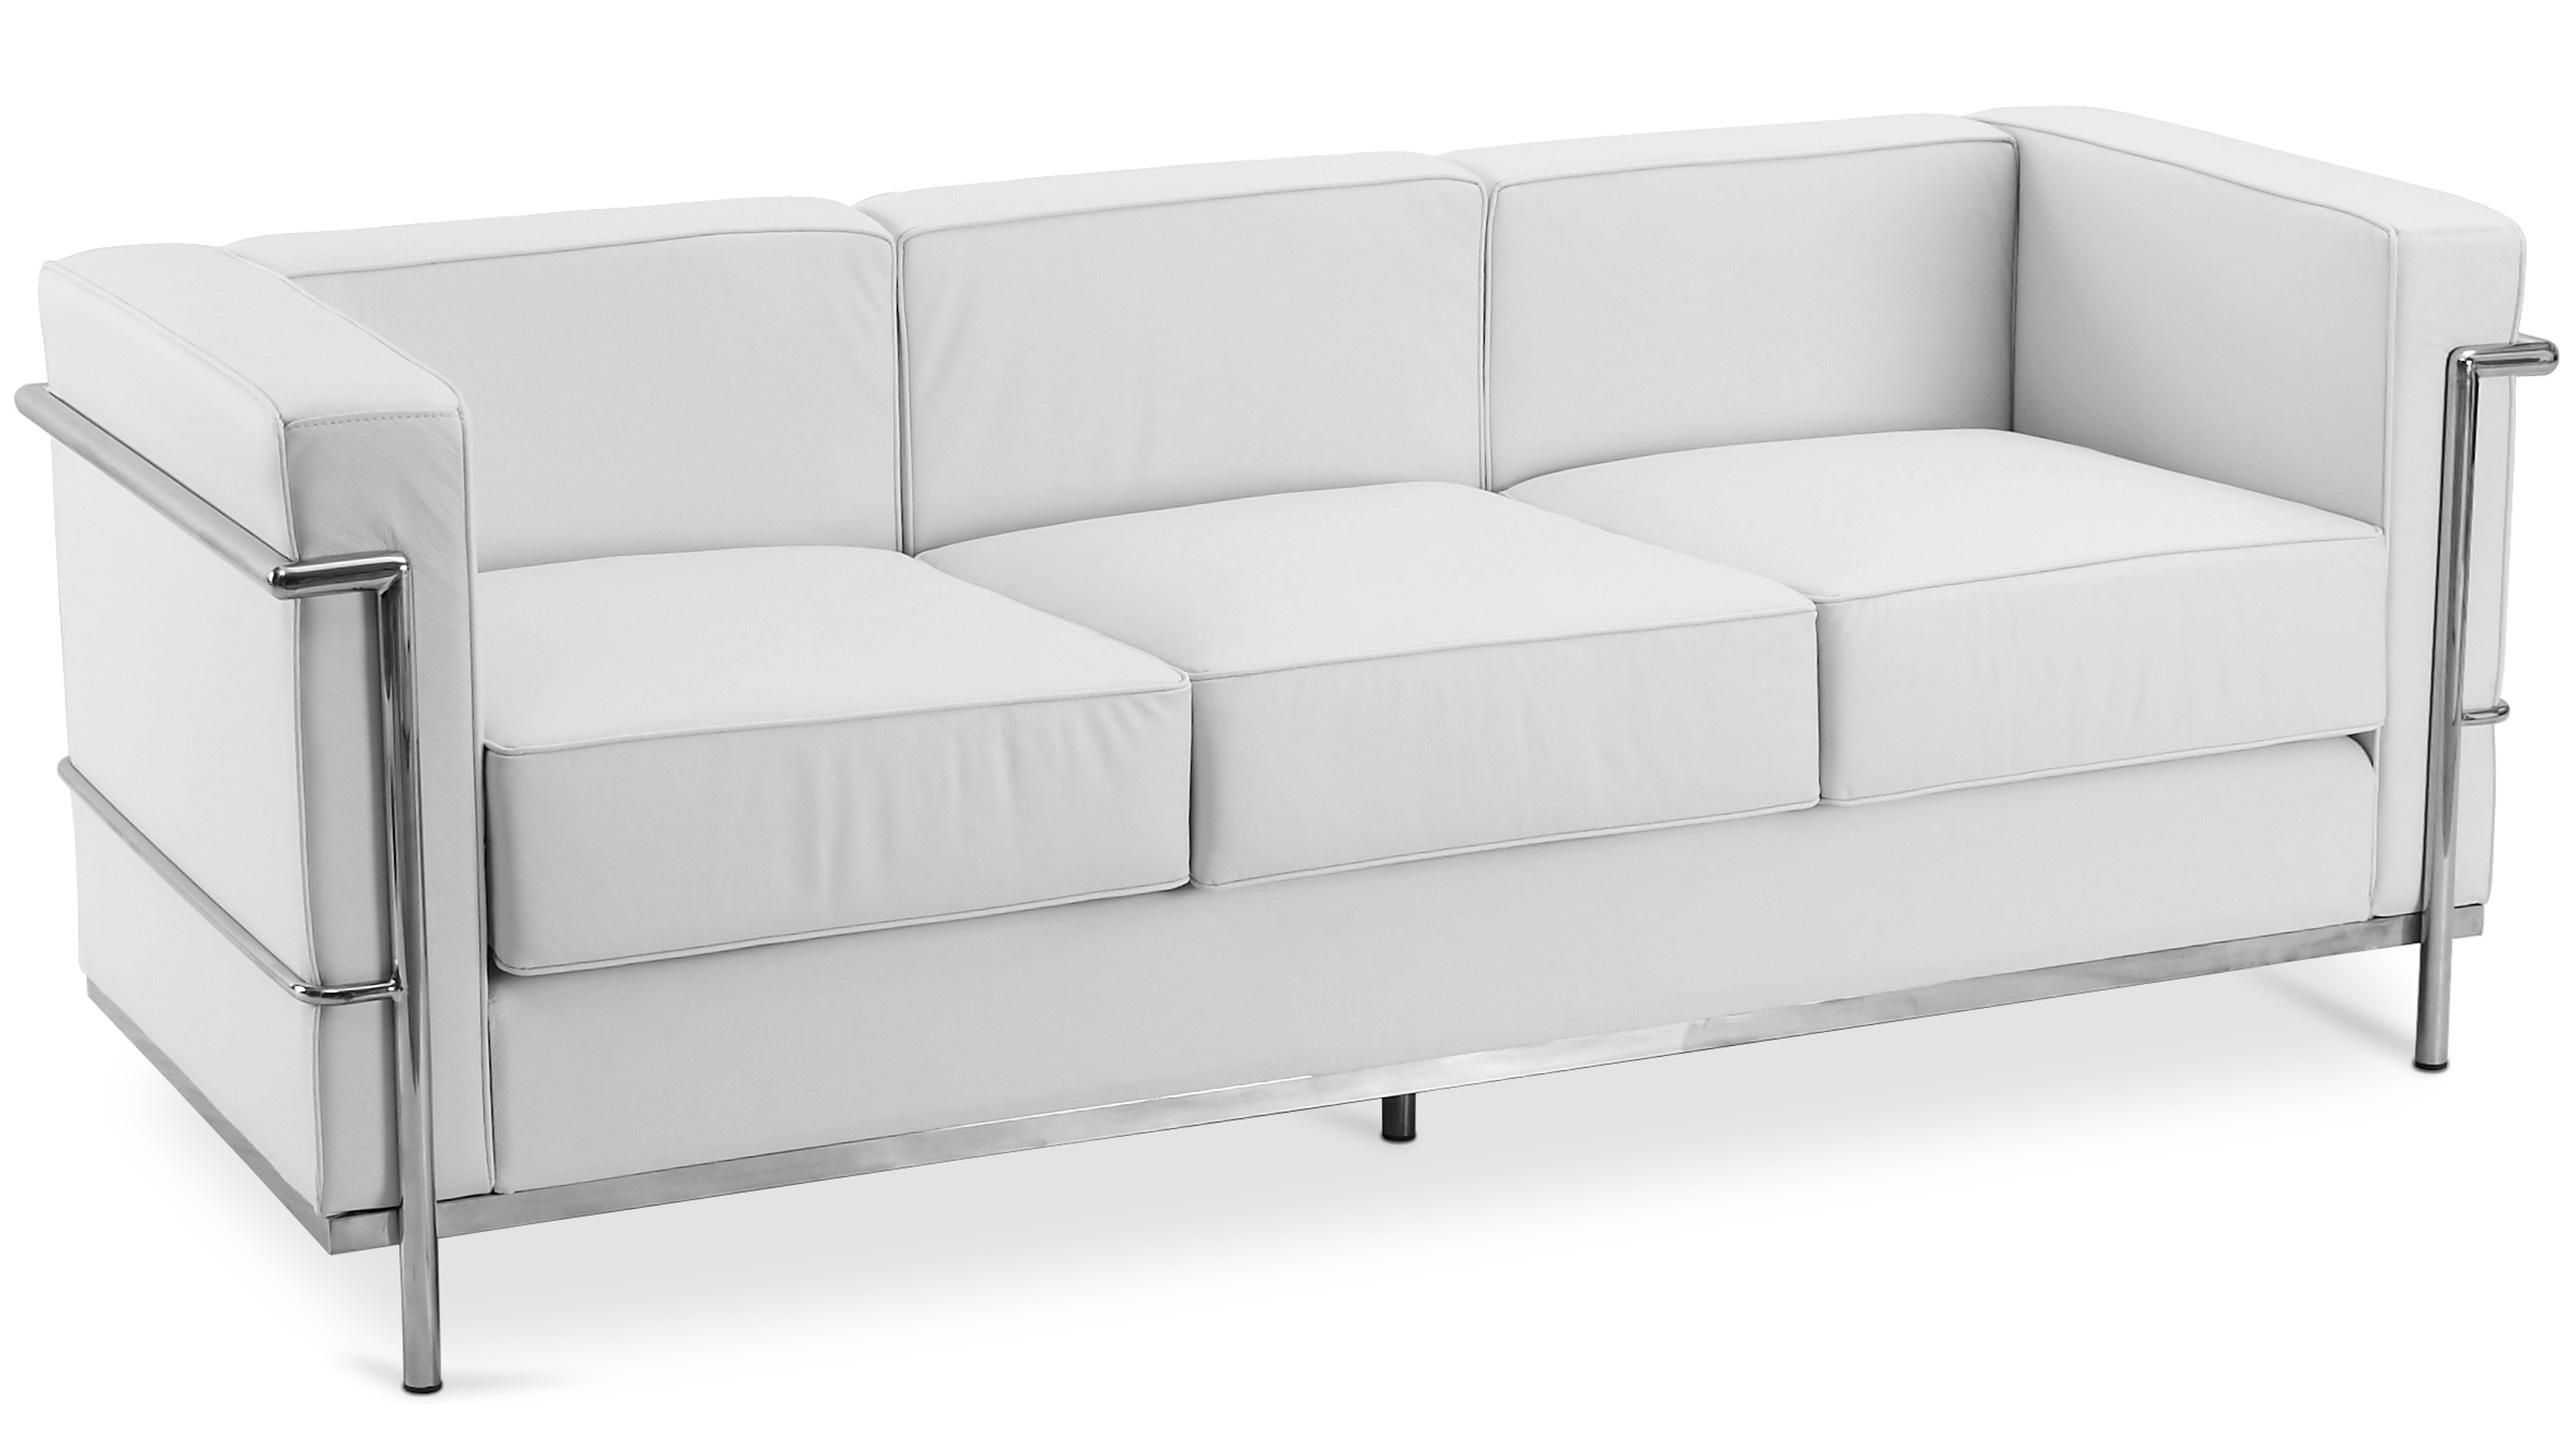 Canap cuir blanc 3 places inspir lc2 - Canape 3 places cuir blanc ...